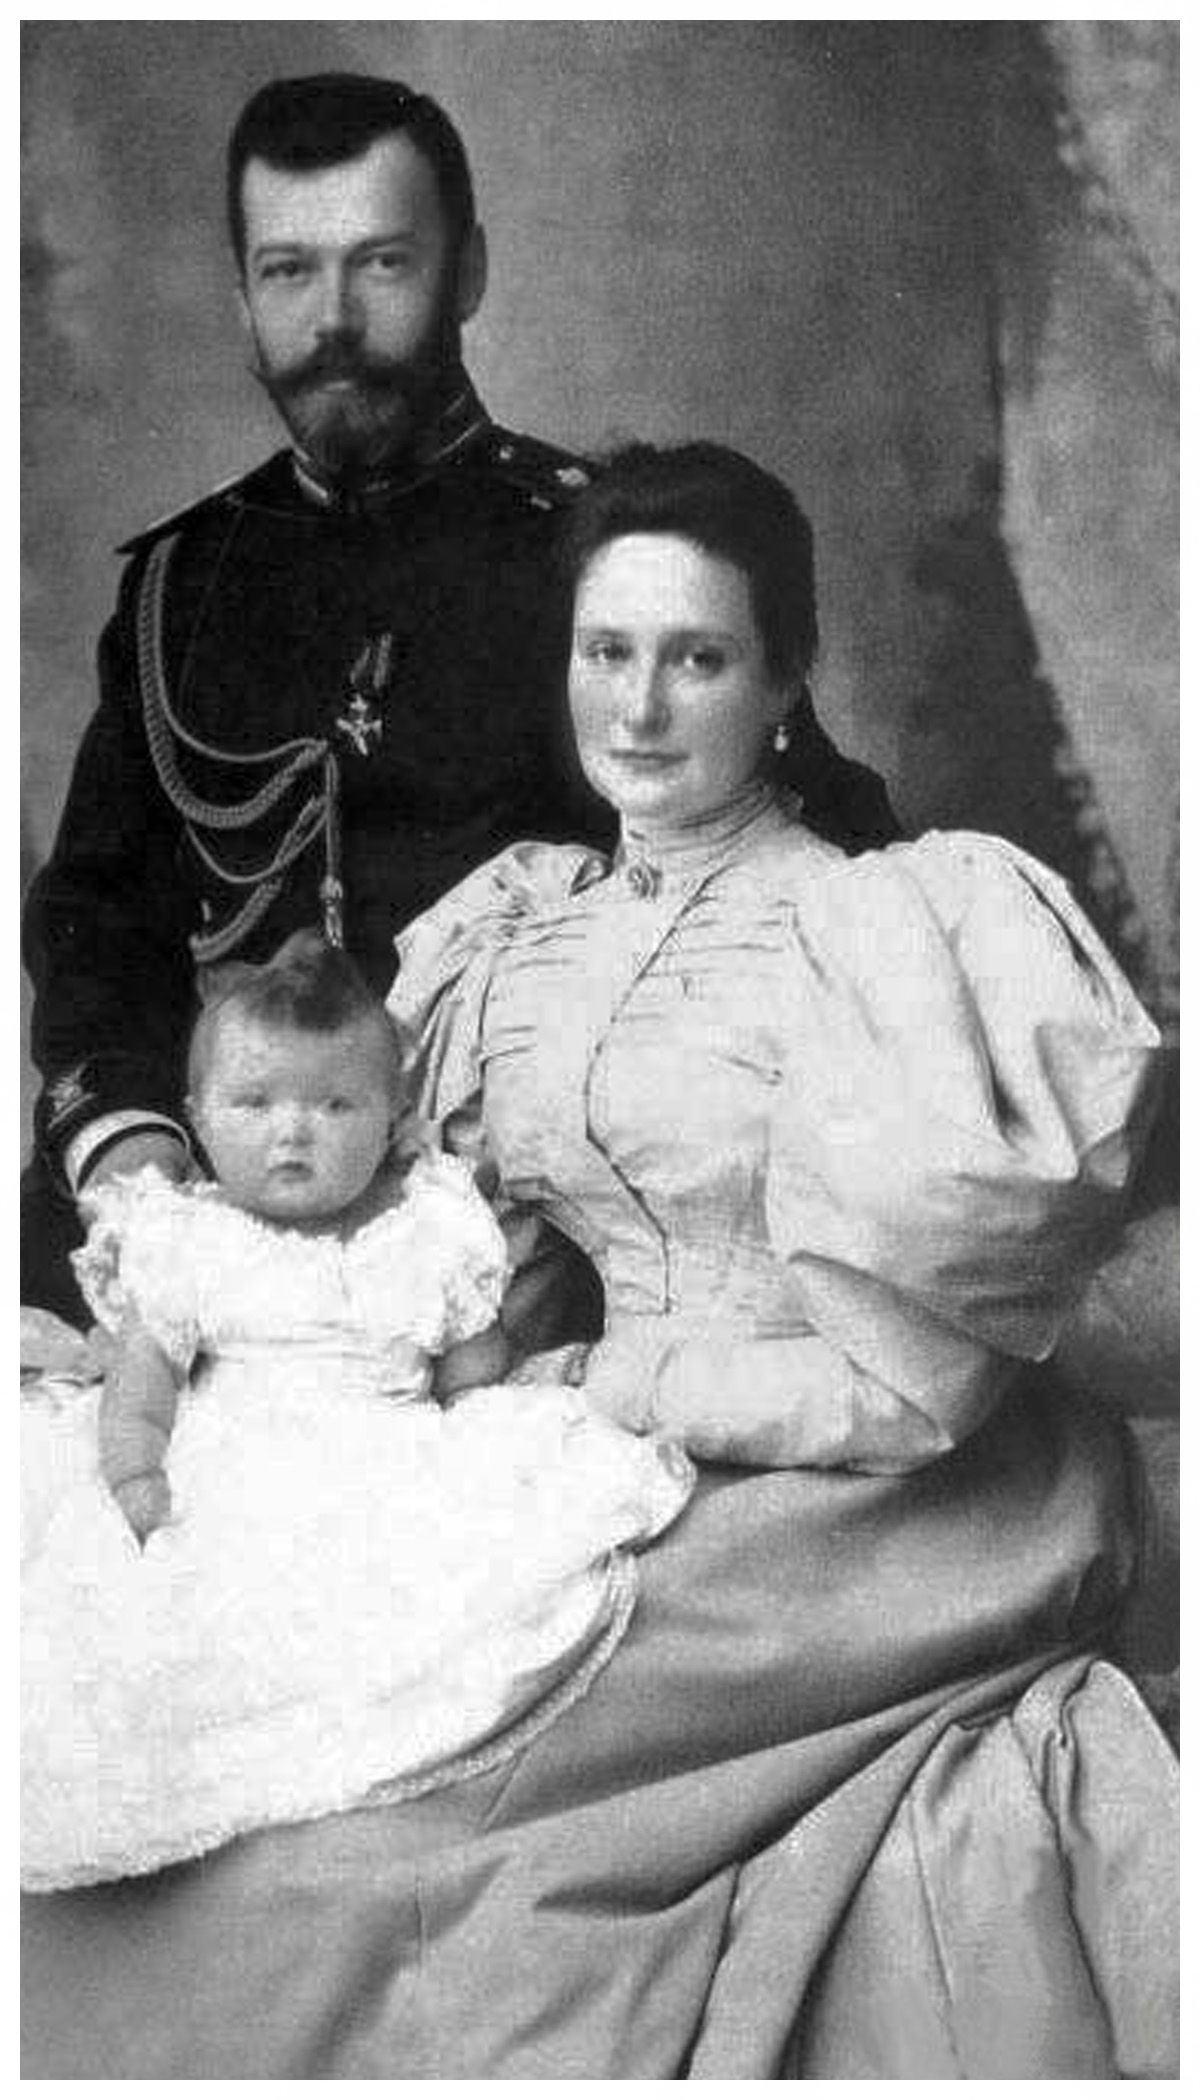 New 11x14 Photo Queen Victoria with Future King Edward VII /& Tsar Nicholas II